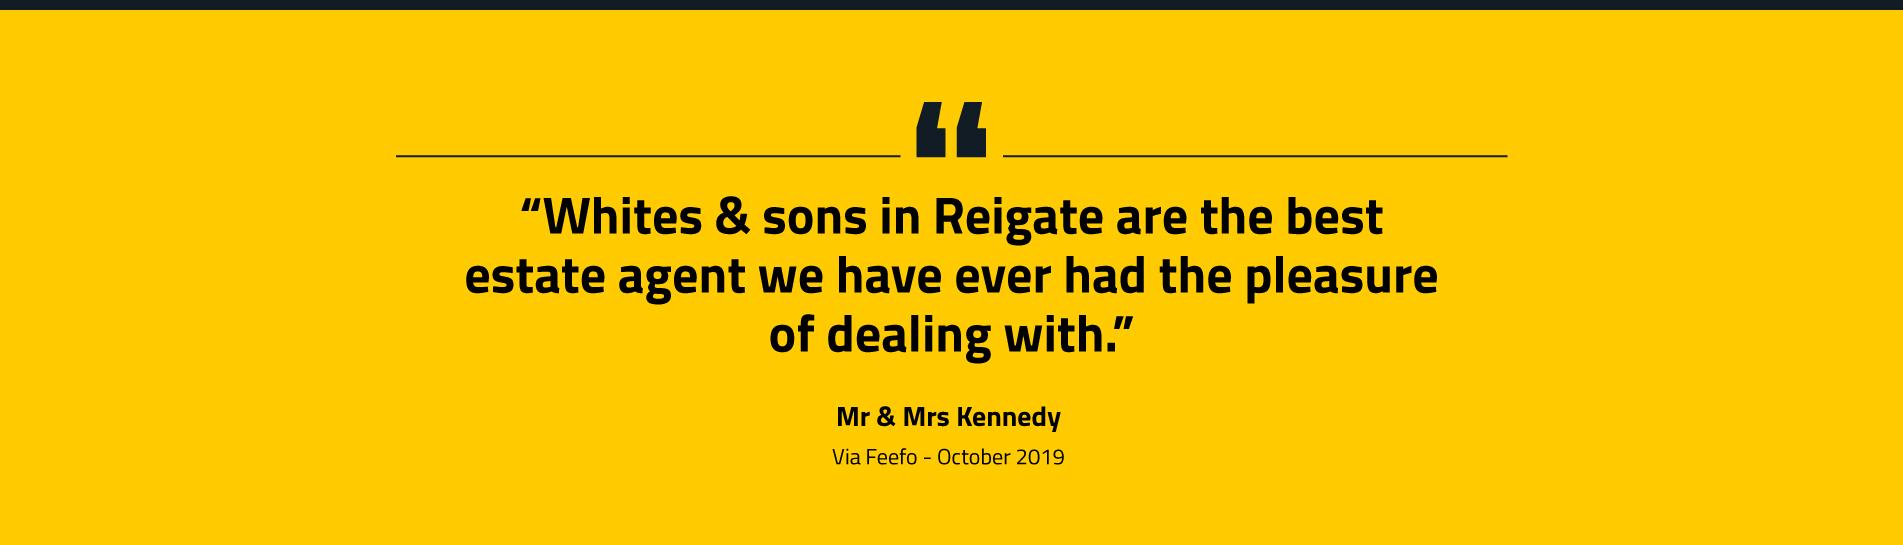 Estate Agent In Reigate White Sons